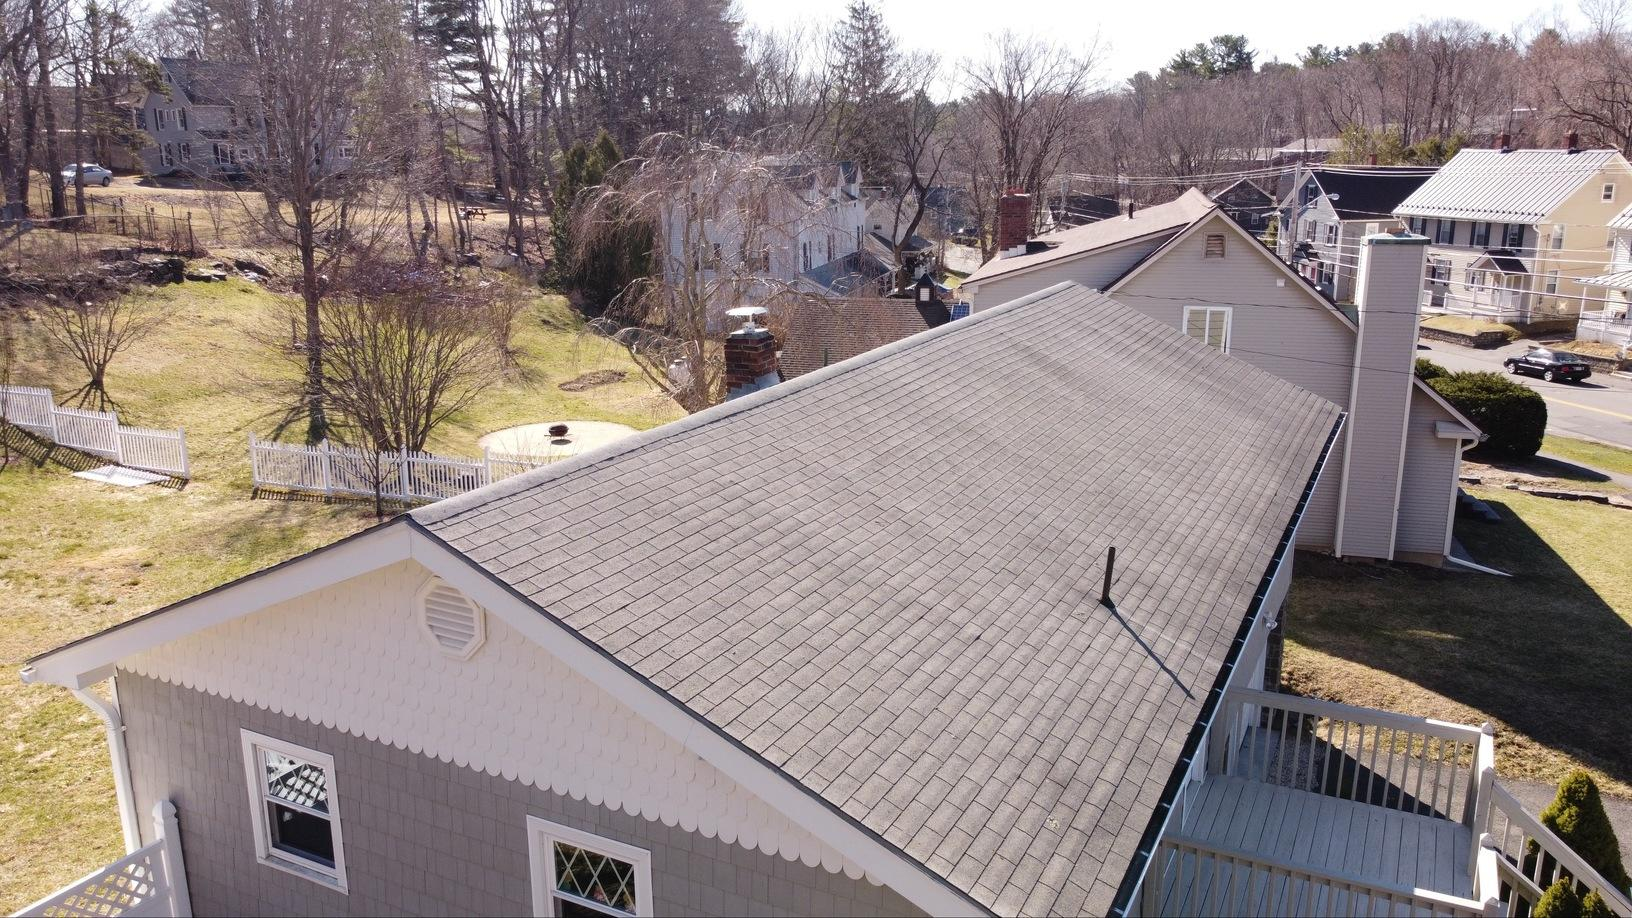 Lenox, MA Roof Replacement IKO Dynasty Atlantic Blue Shingles - Before Photo